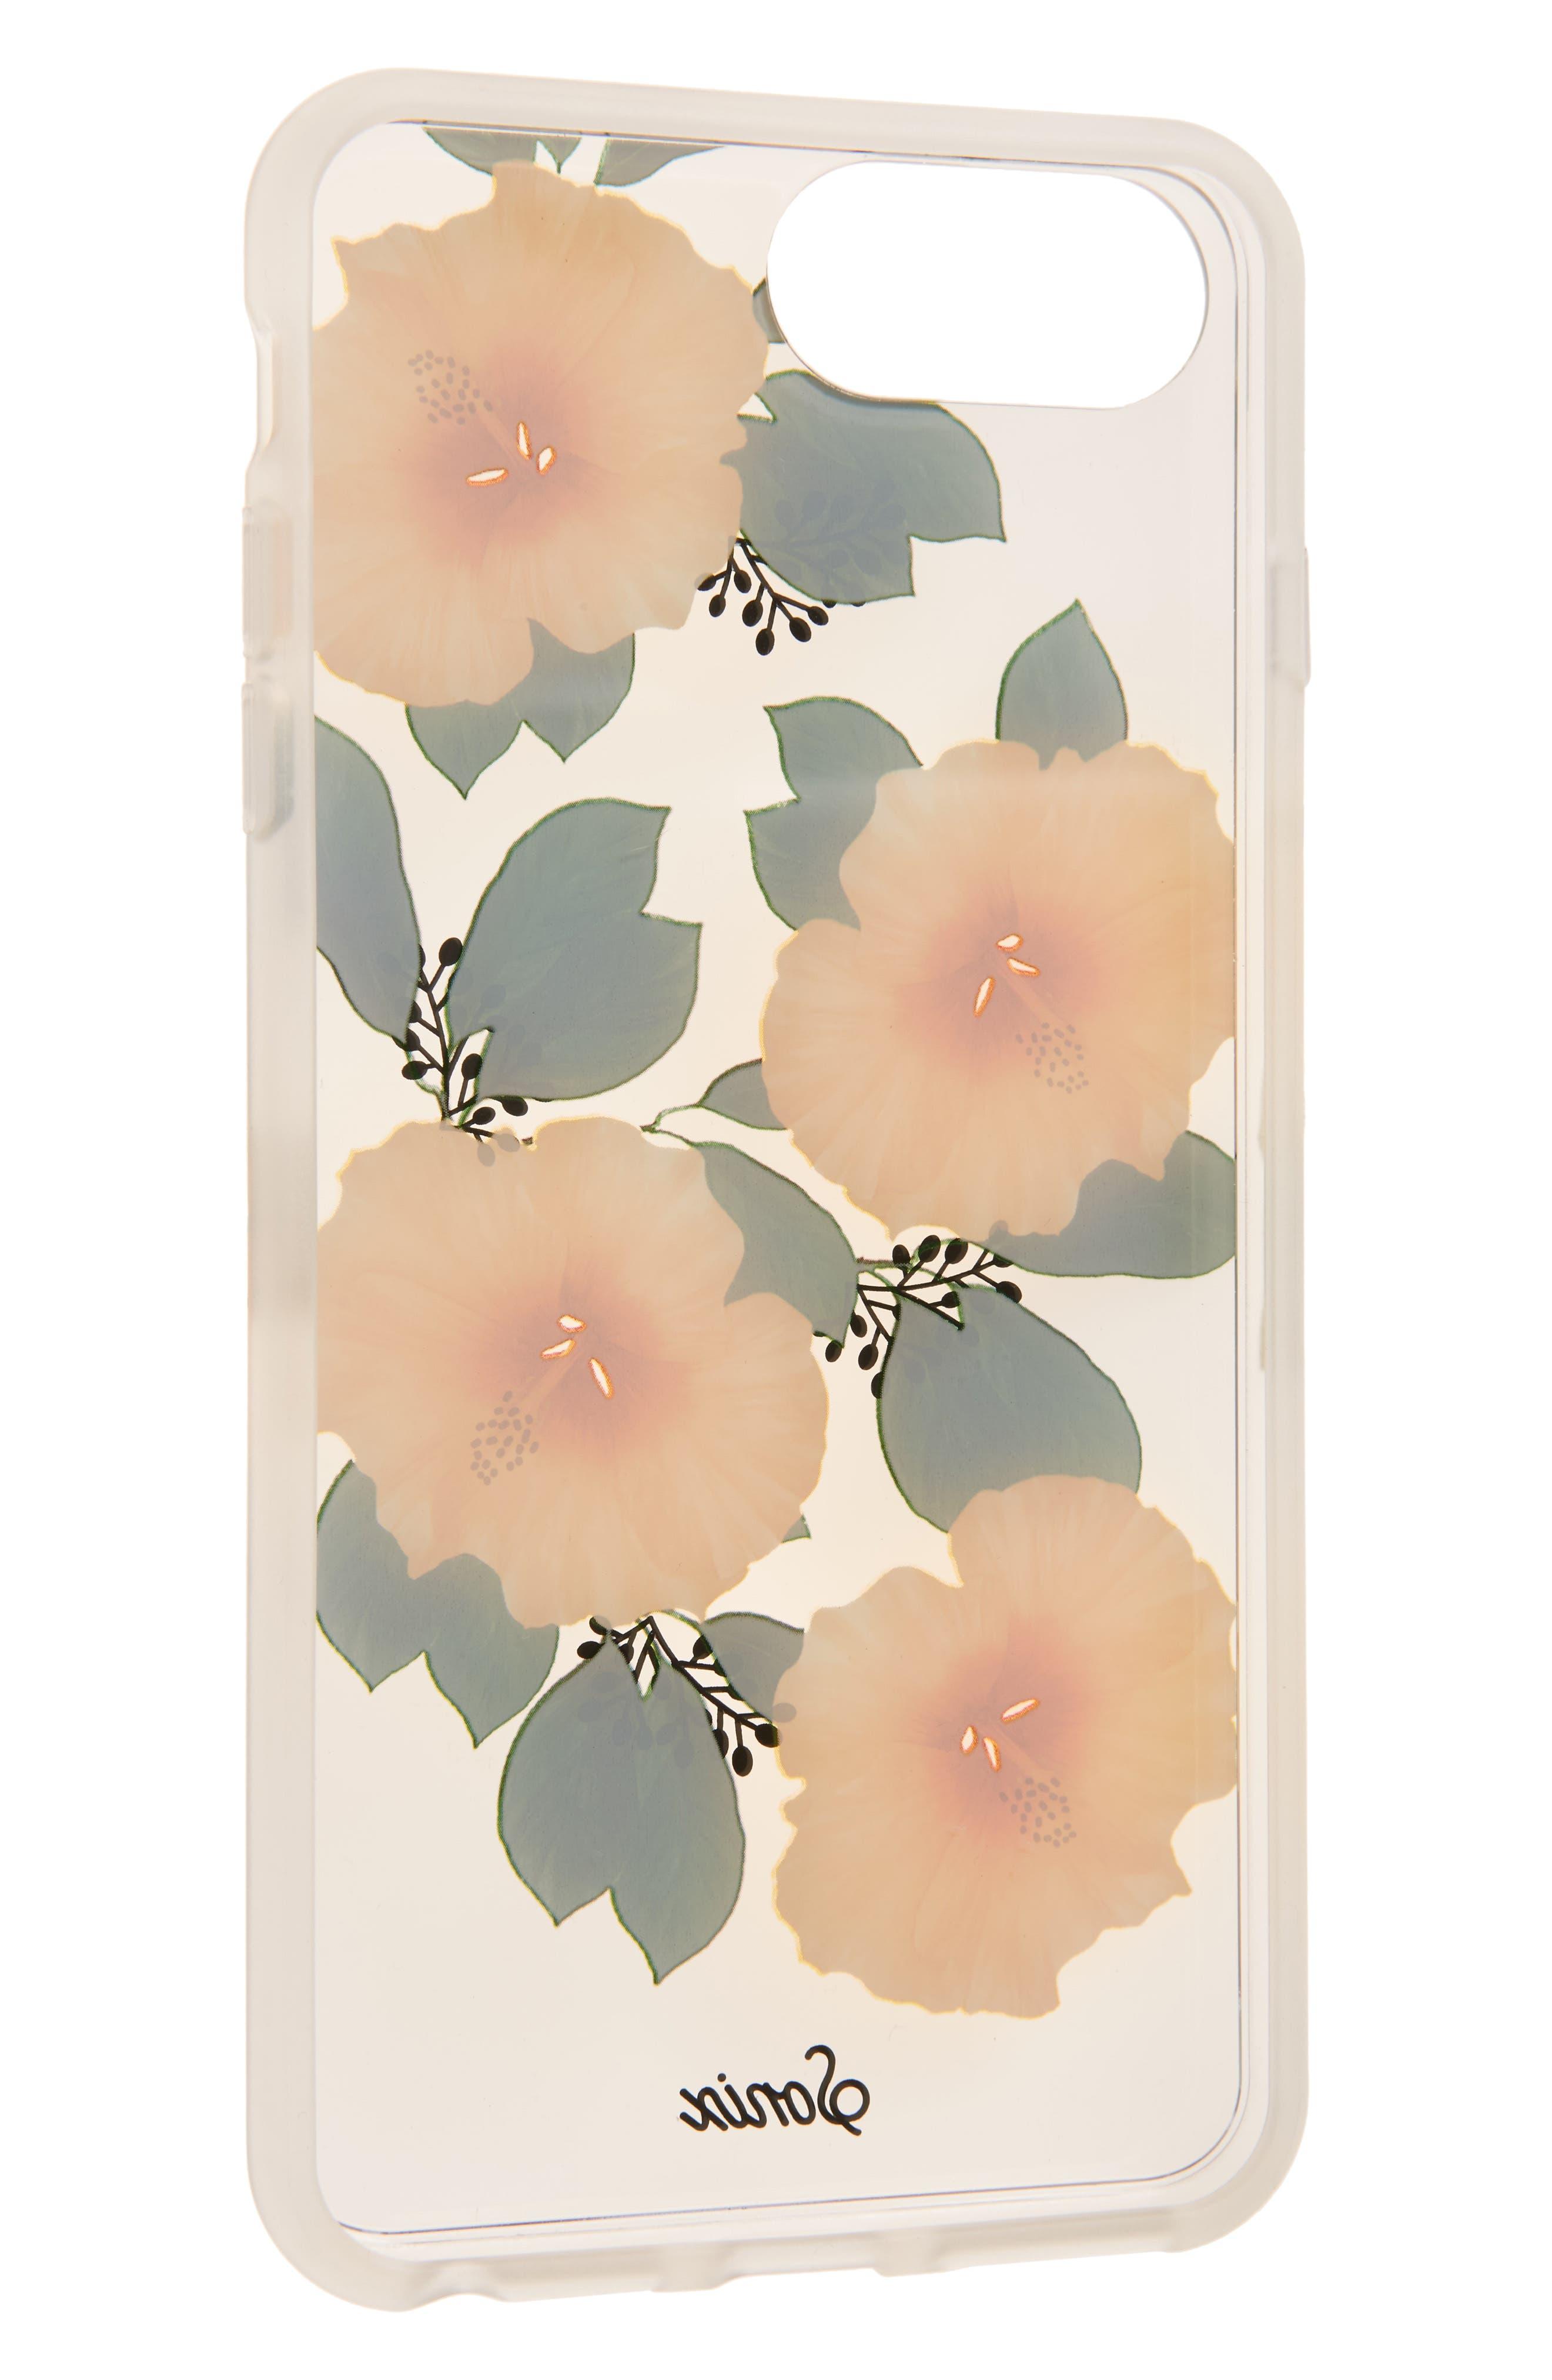 Hibiscus iPhone 6/6s/7/8 & 6/6s/7/8 Plus Case,                             Alternate thumbnail 2, color,                             700